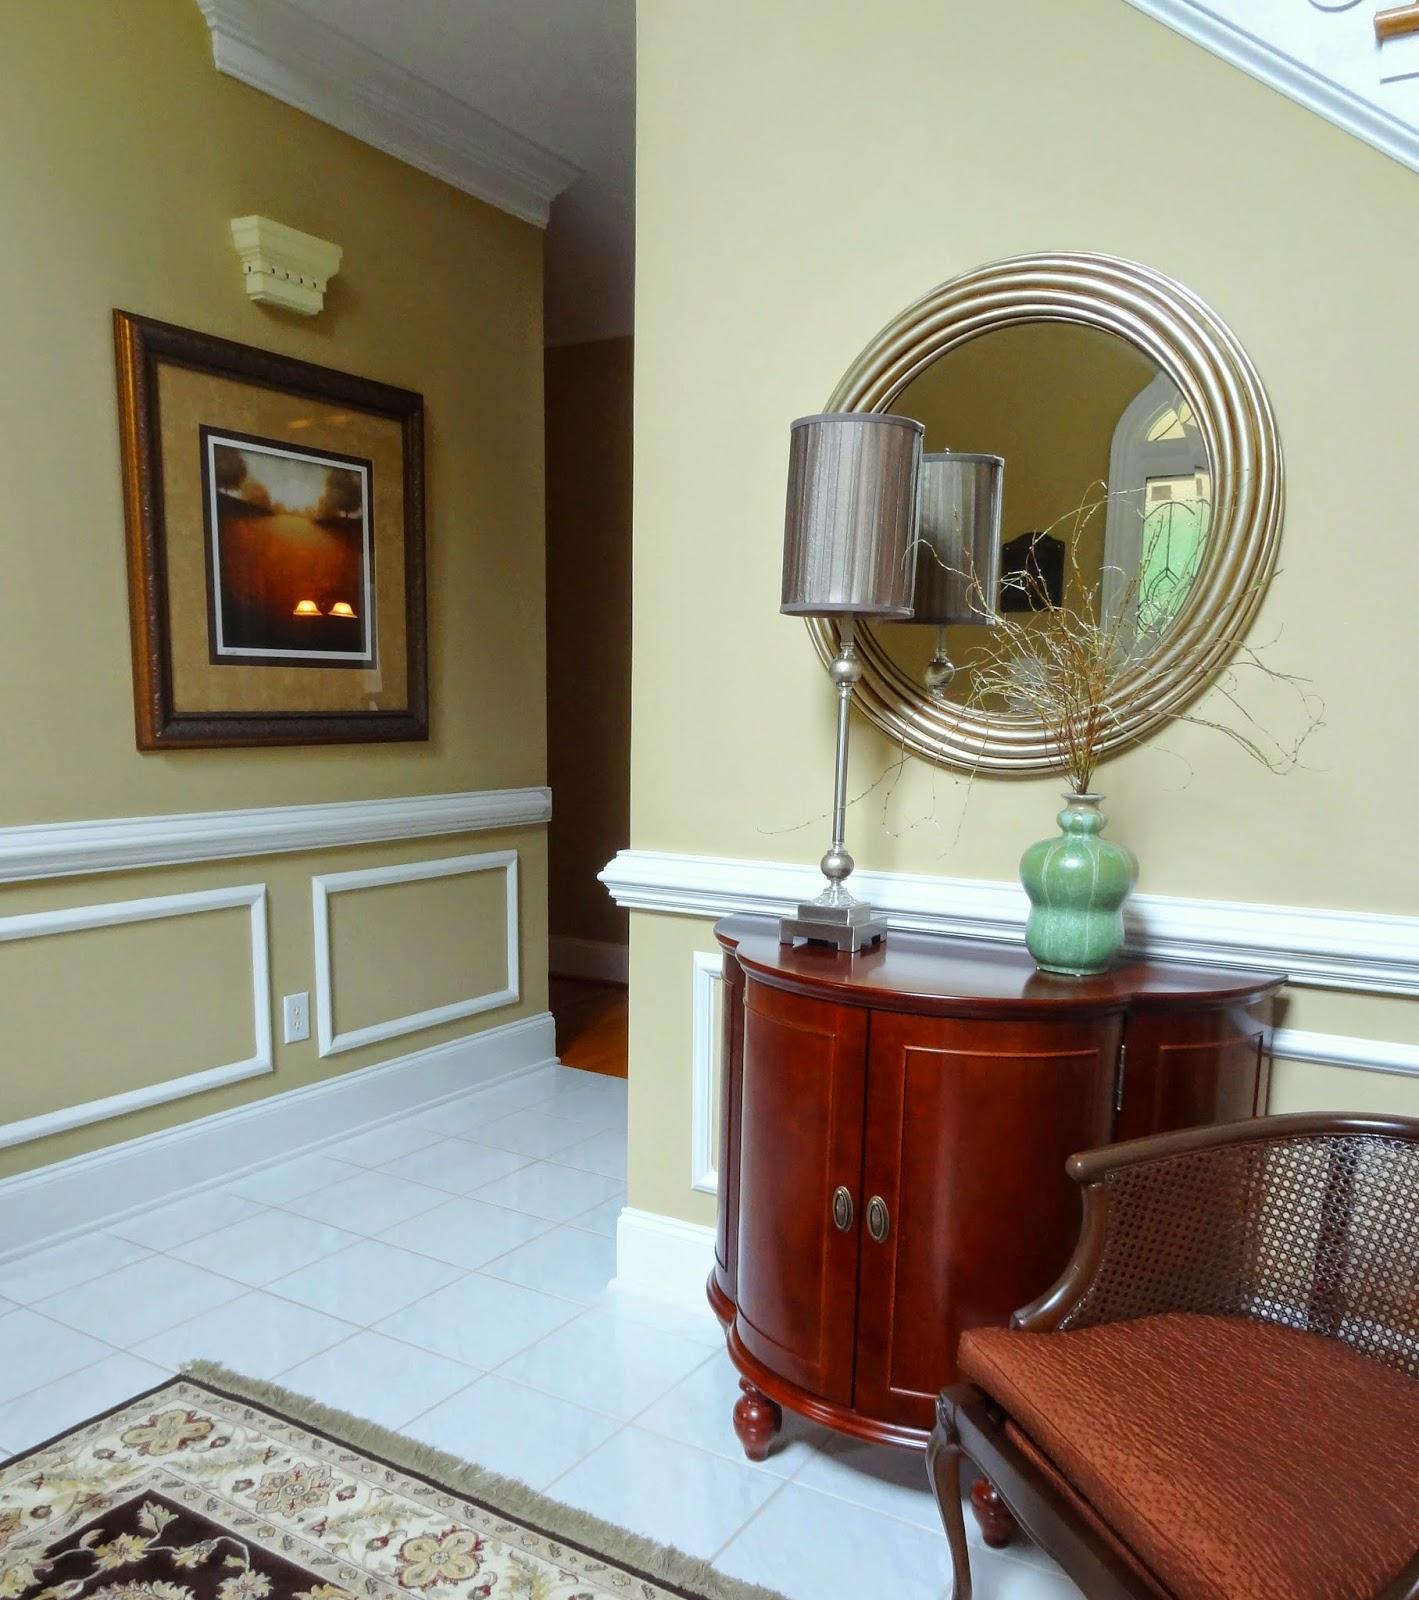 Transforming Rooms